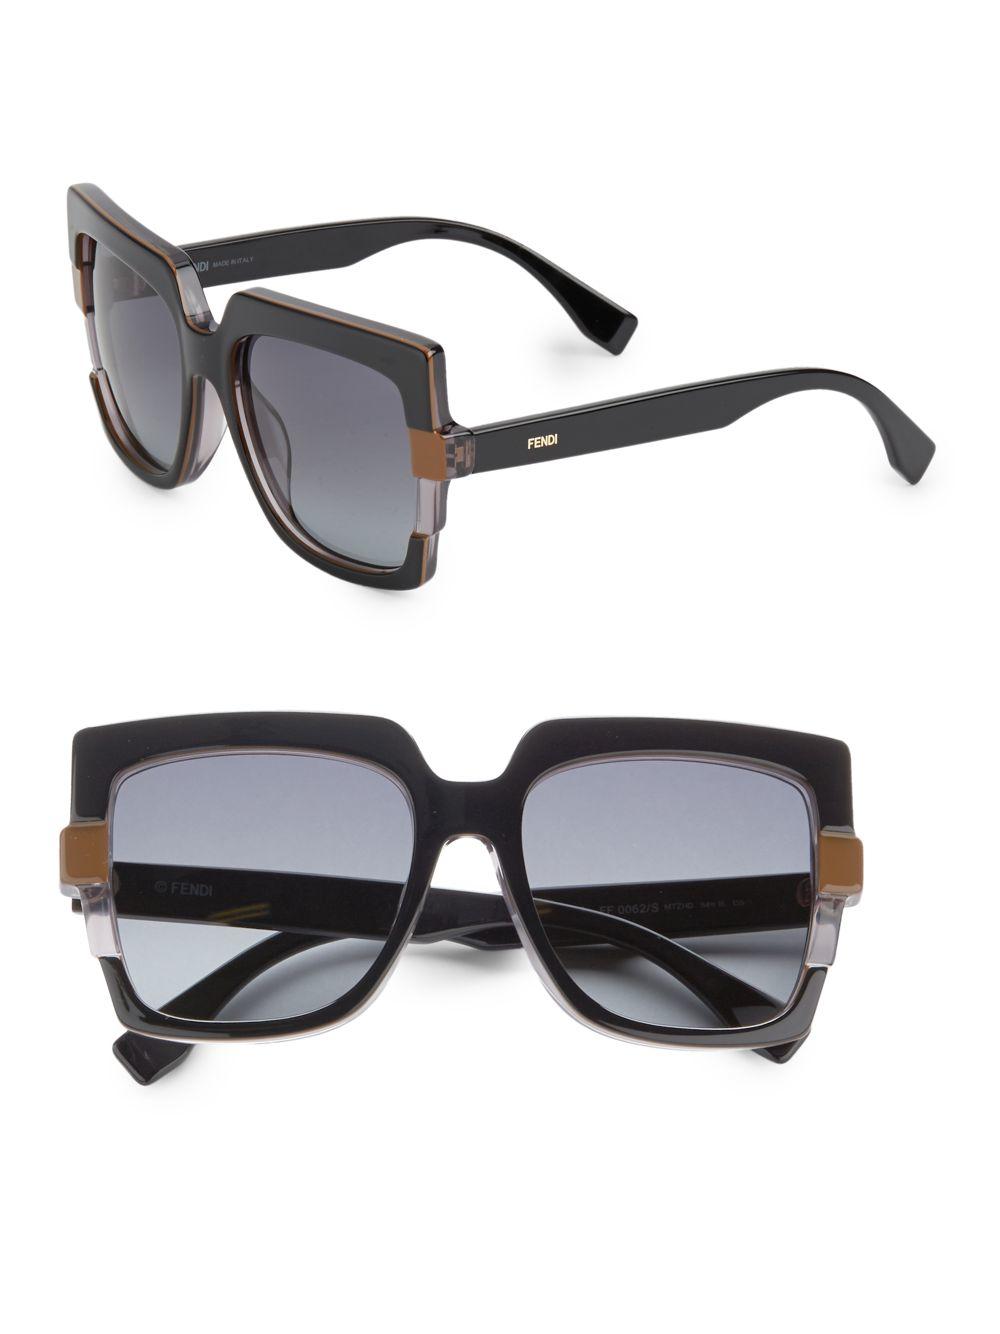 Lyst Fendi 54mm Oversized Square Sunglasses In Black